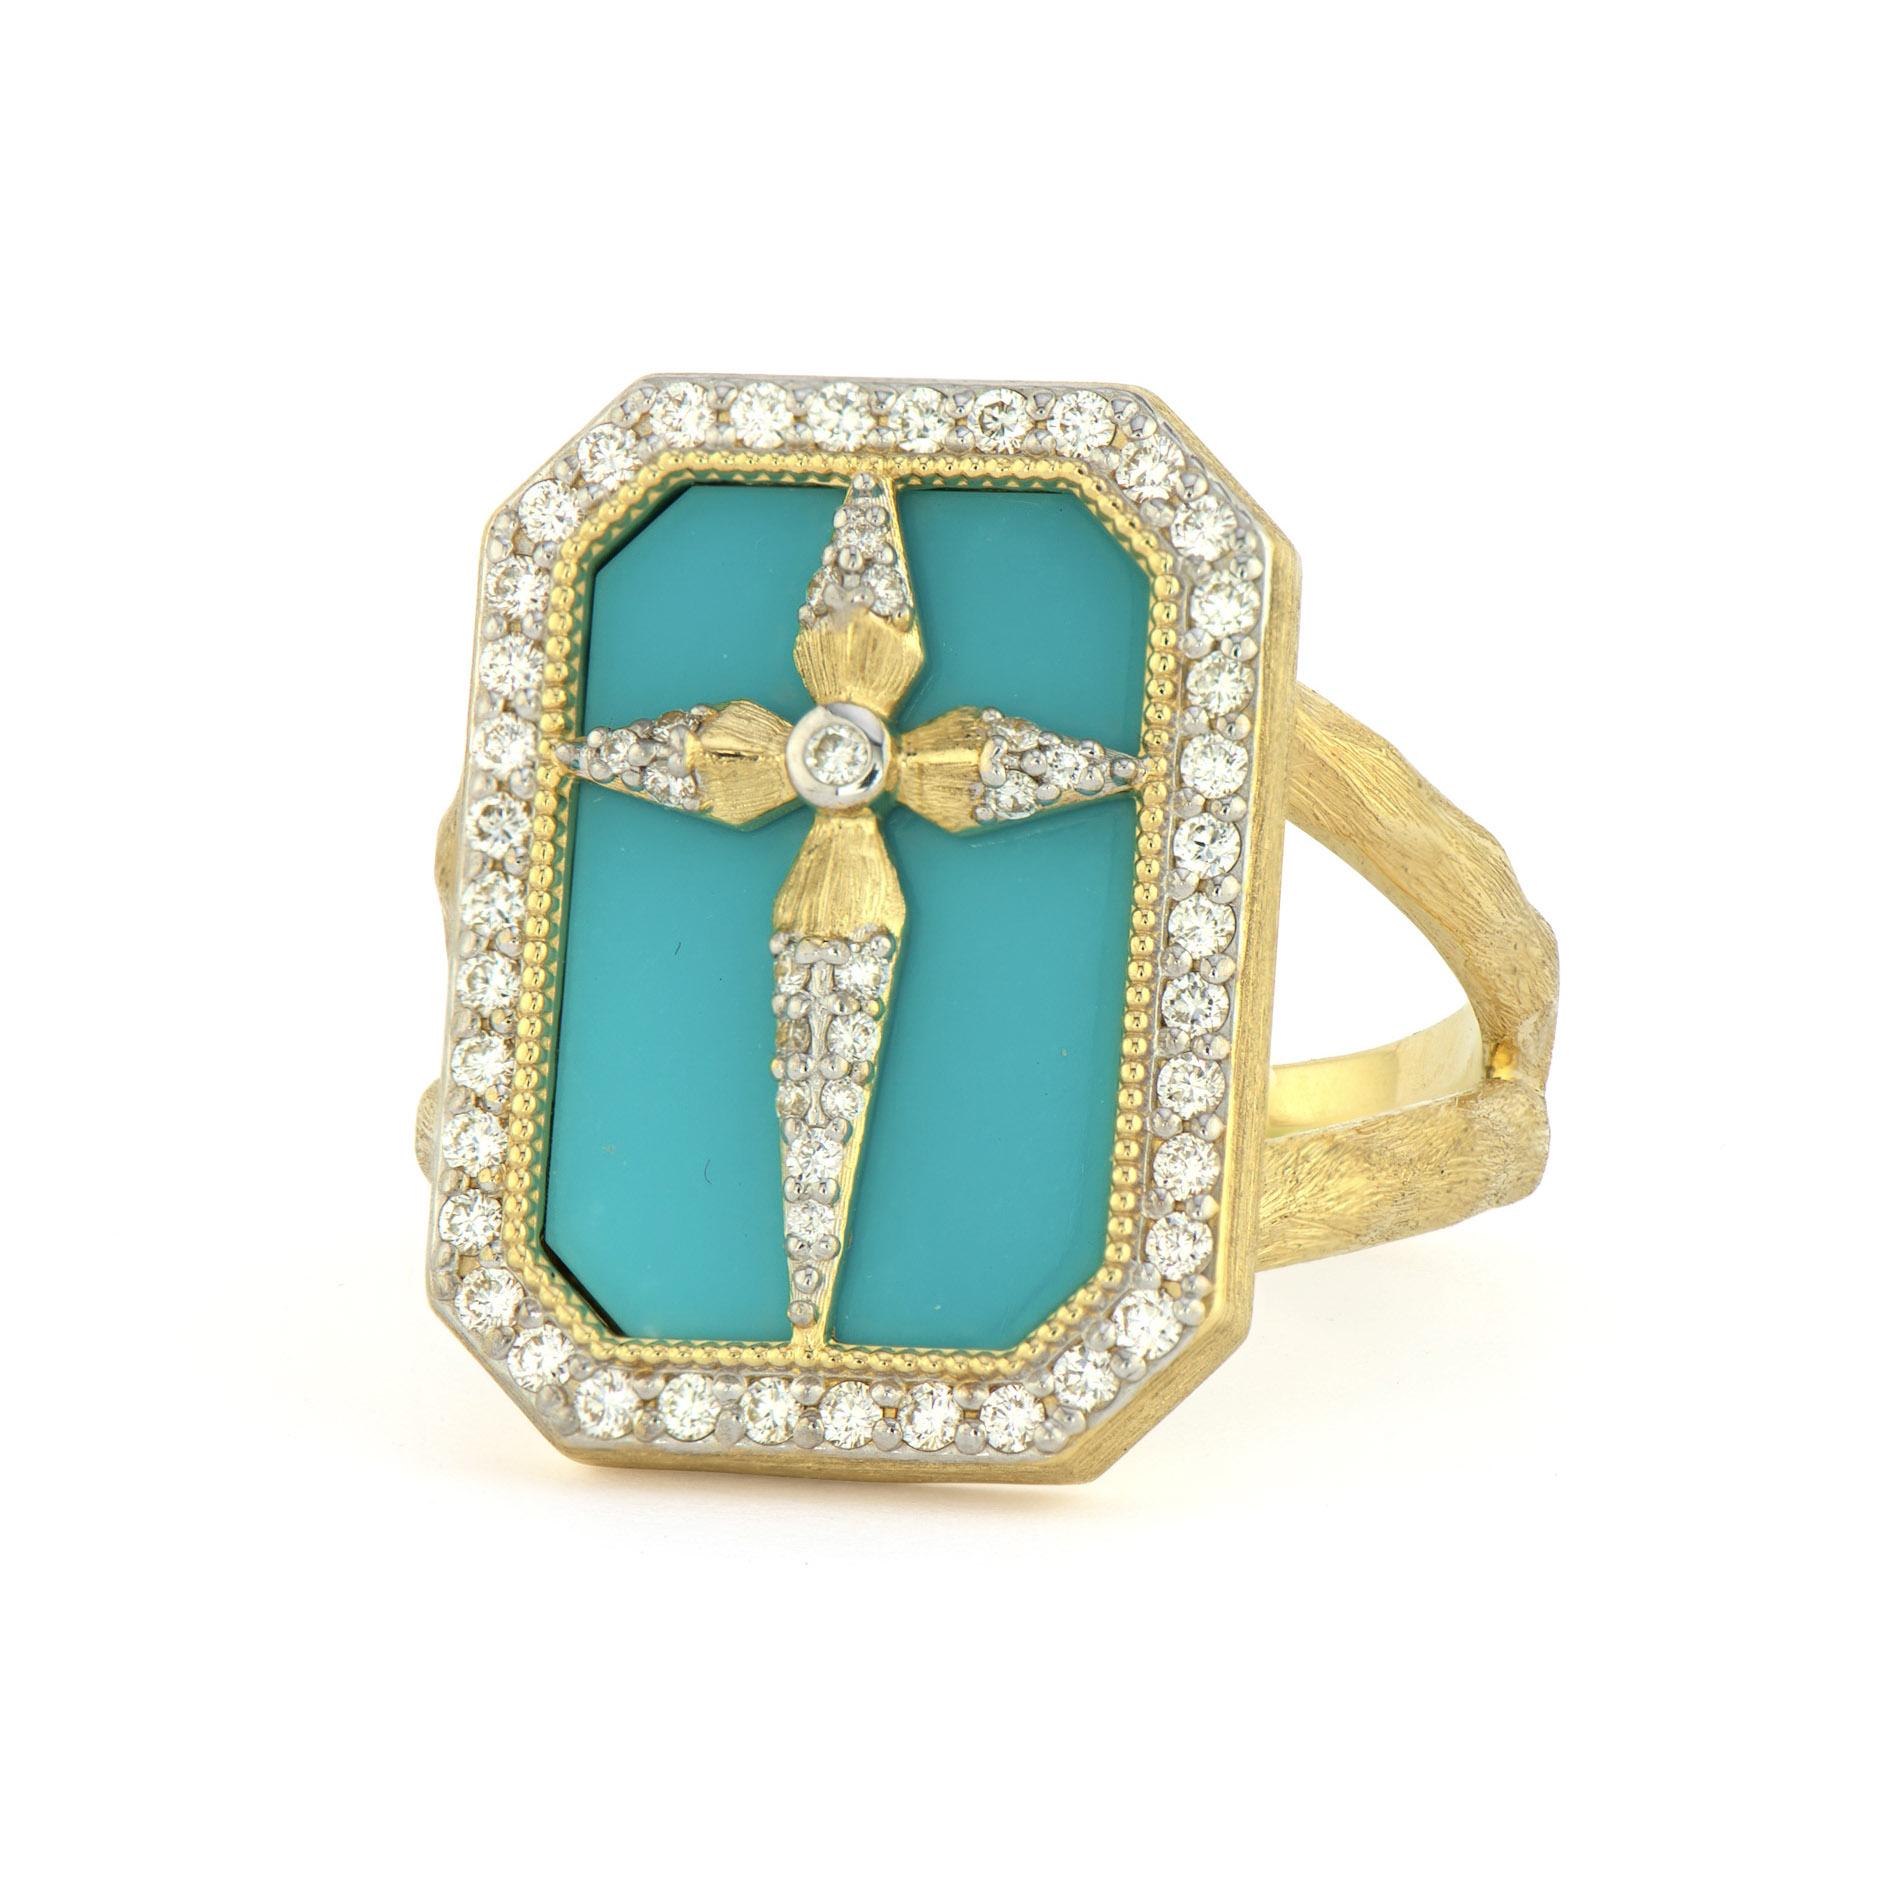 Teal cross ring